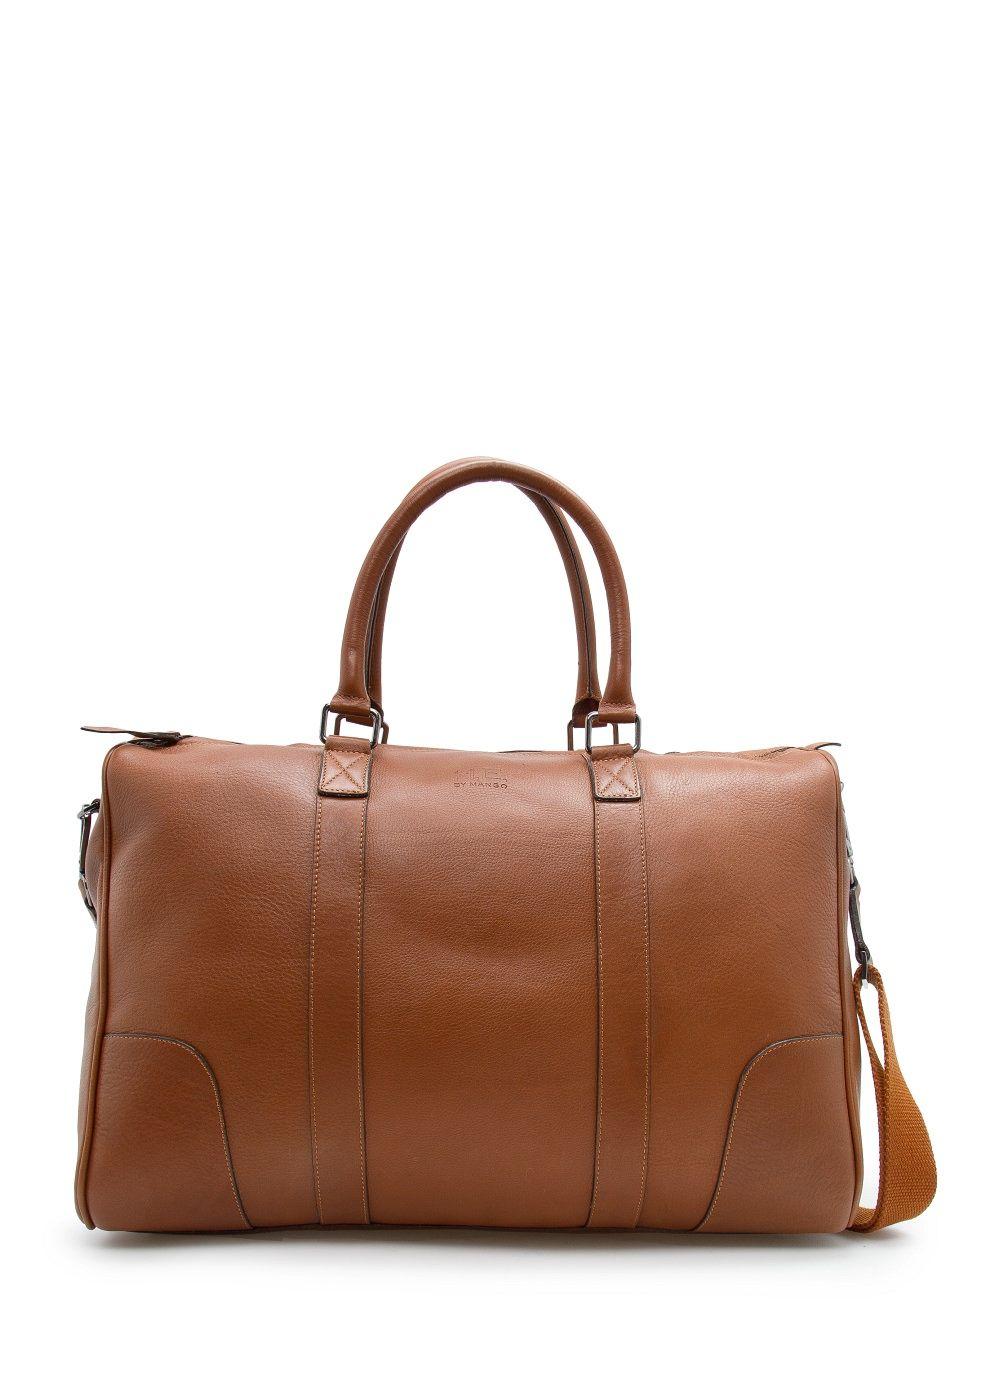 sac week end cuir cuir sacs et accessoires. Black Bedroom Furniture Sets. Home Design Ideas